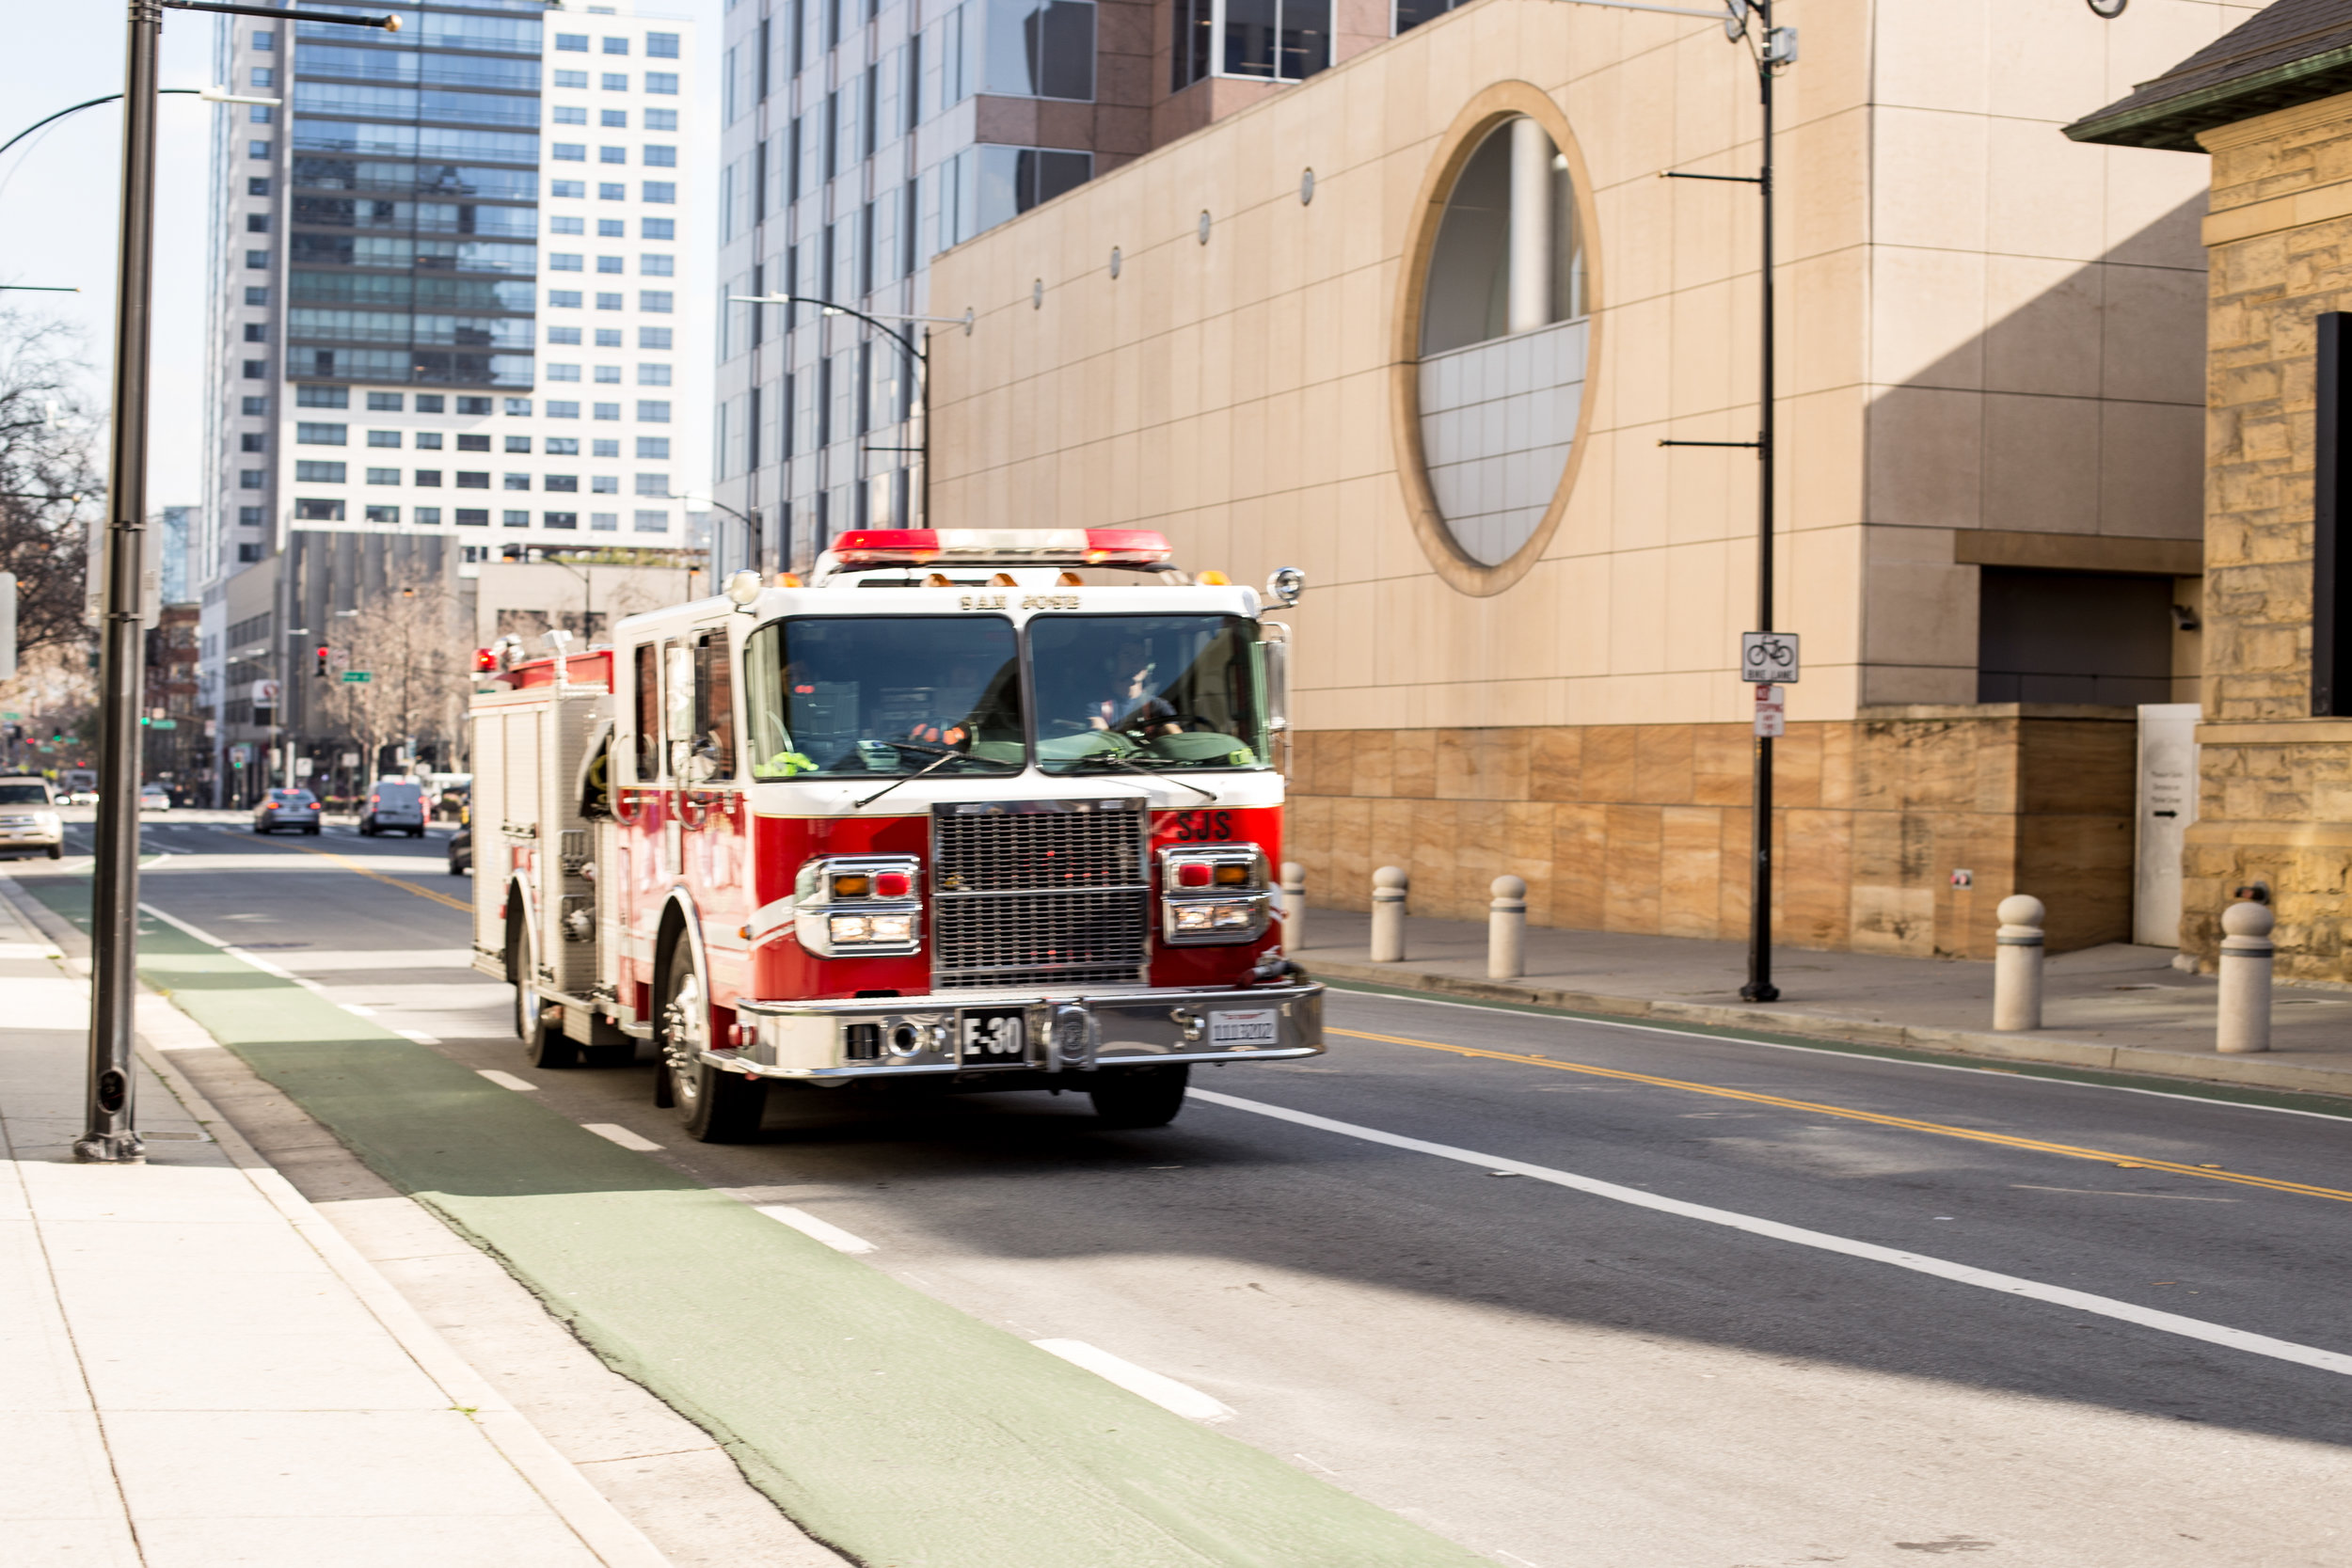 San Jose firetruck driving in downtown